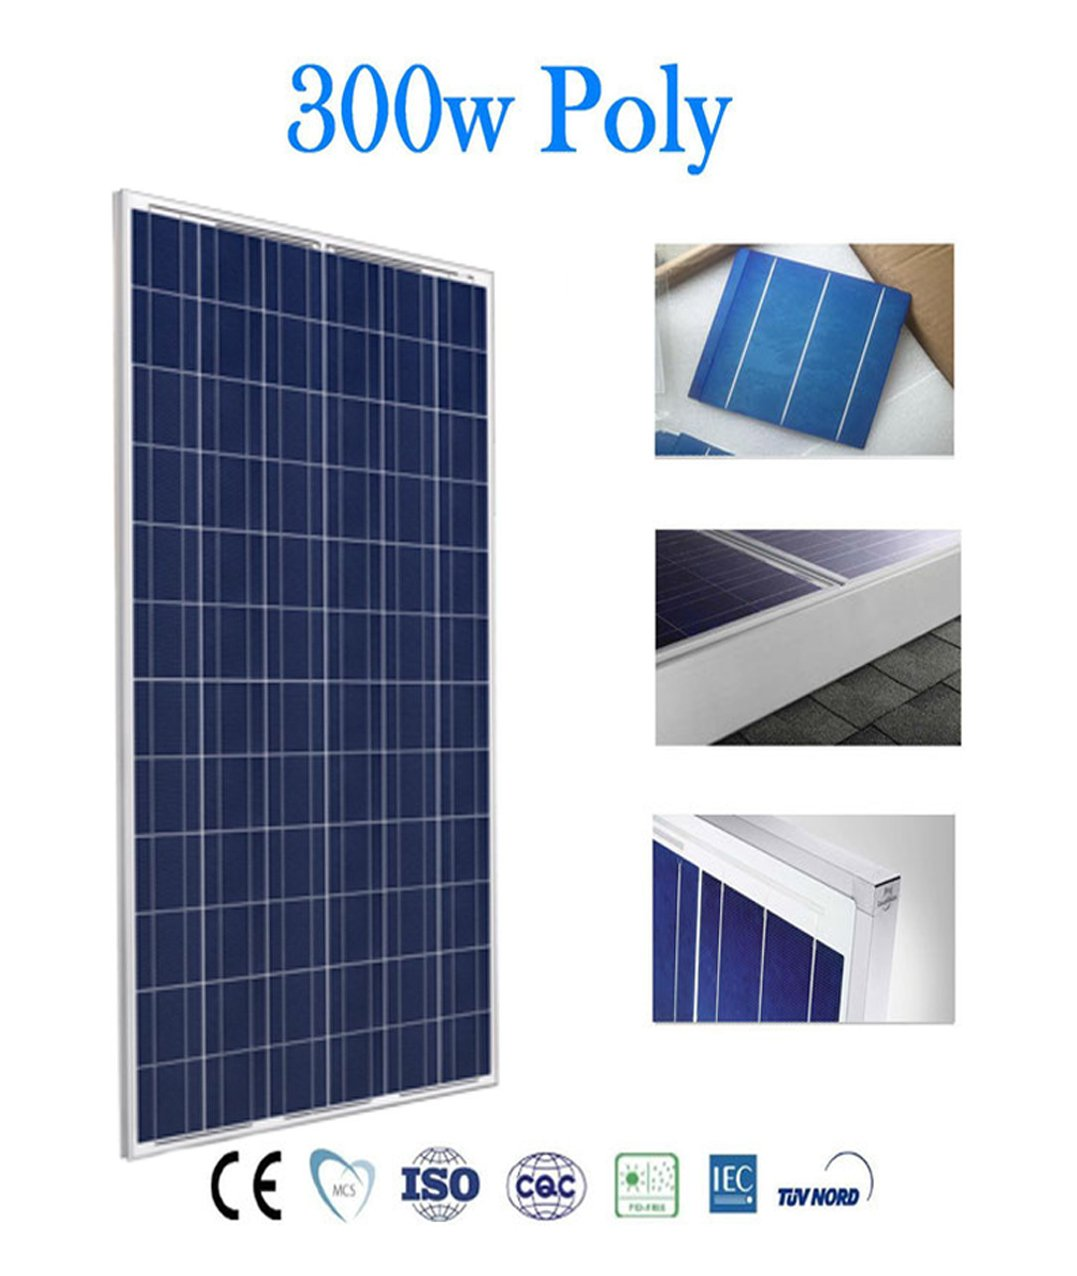 300W 48V Solar panels: 150W 250W Dimensiones :1480 * 640 * 40 mm 24V 330W polycrystalline solar plaque 12V